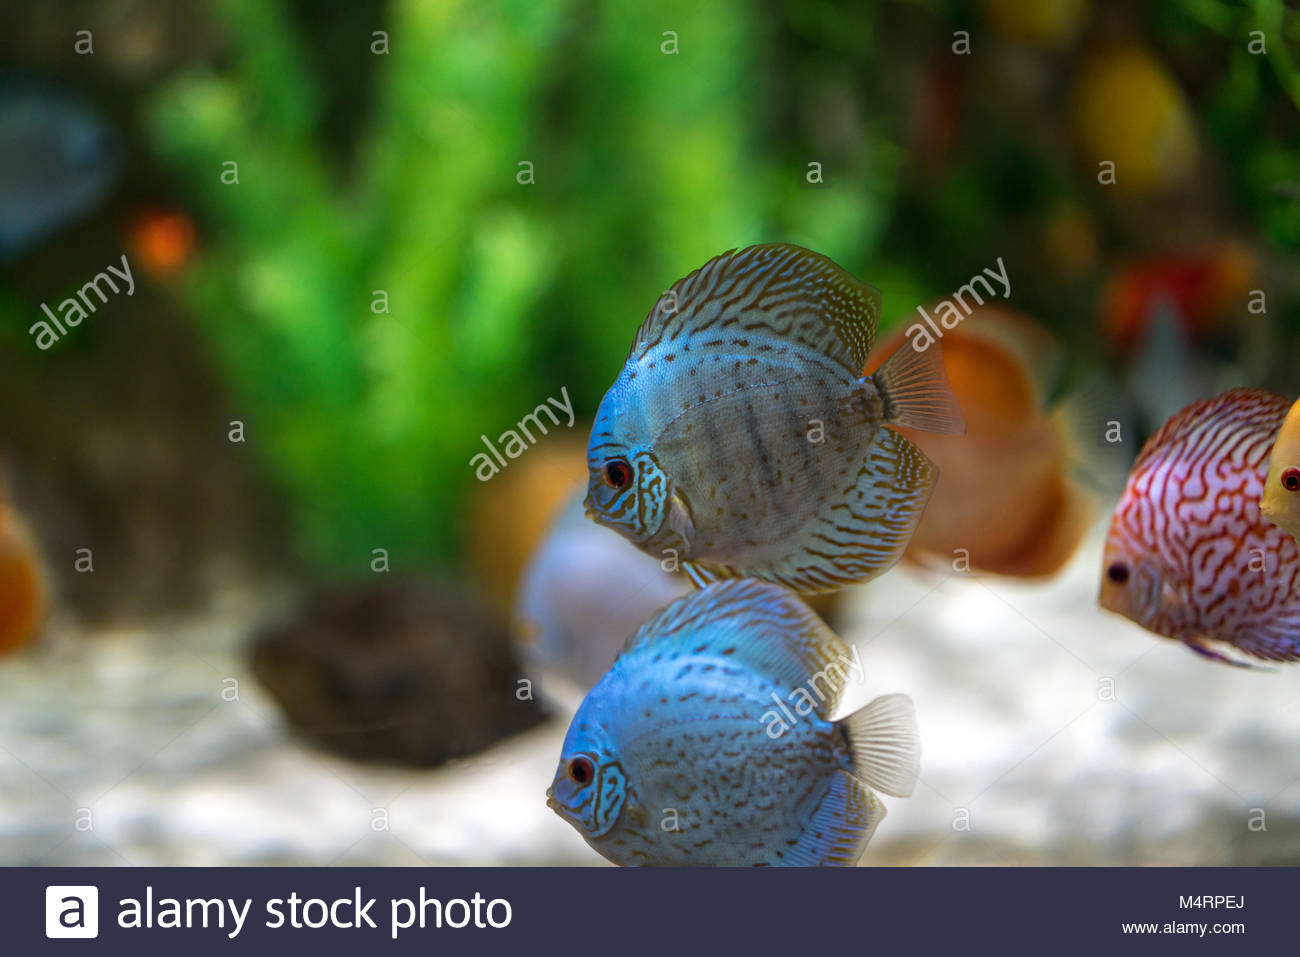 Symphysodon discus fish in an aquarium Stock Photo: 175084858 - Alamy